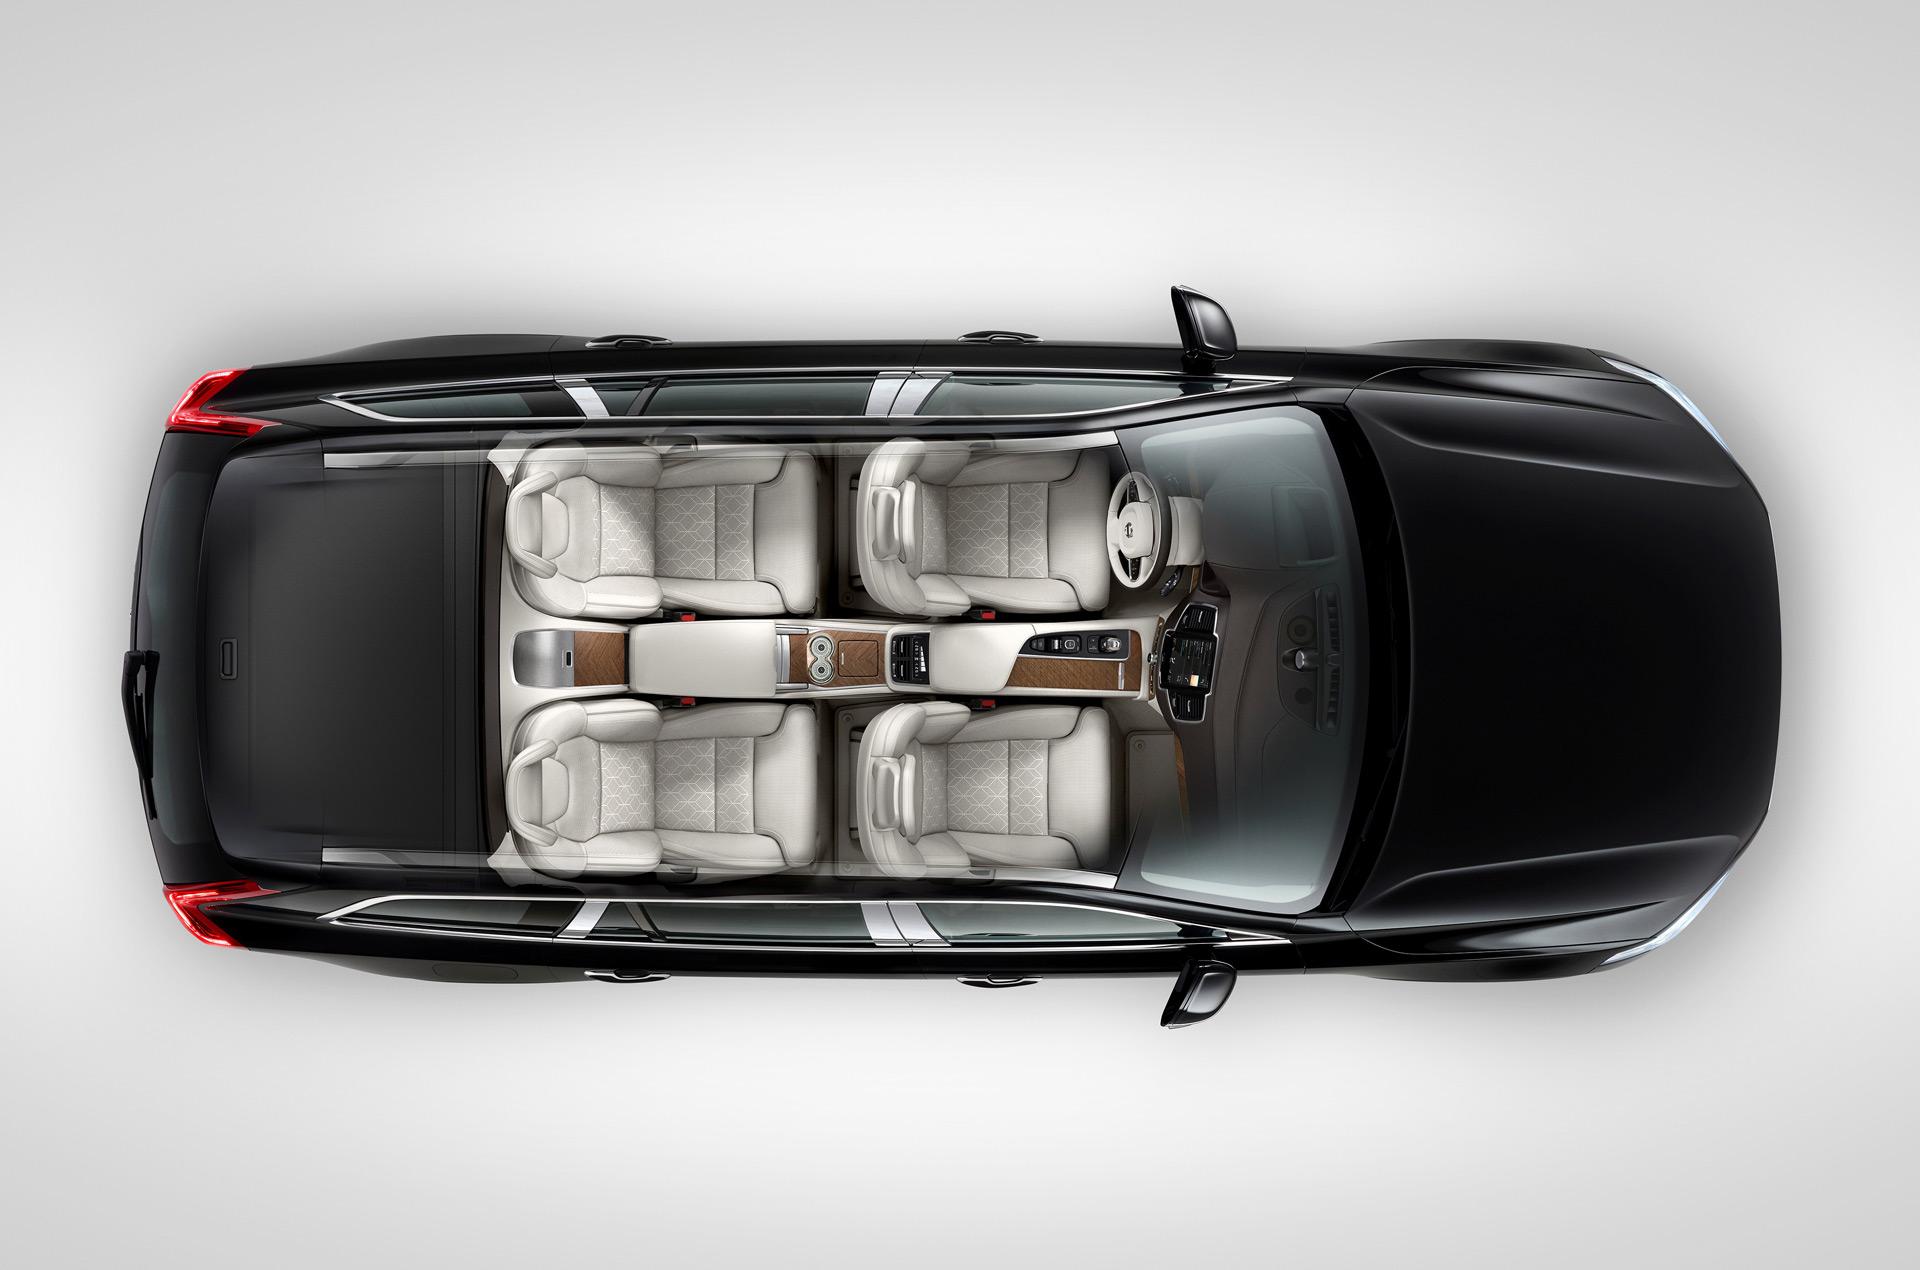 Suv 2016 Seating Xc90 Volvo